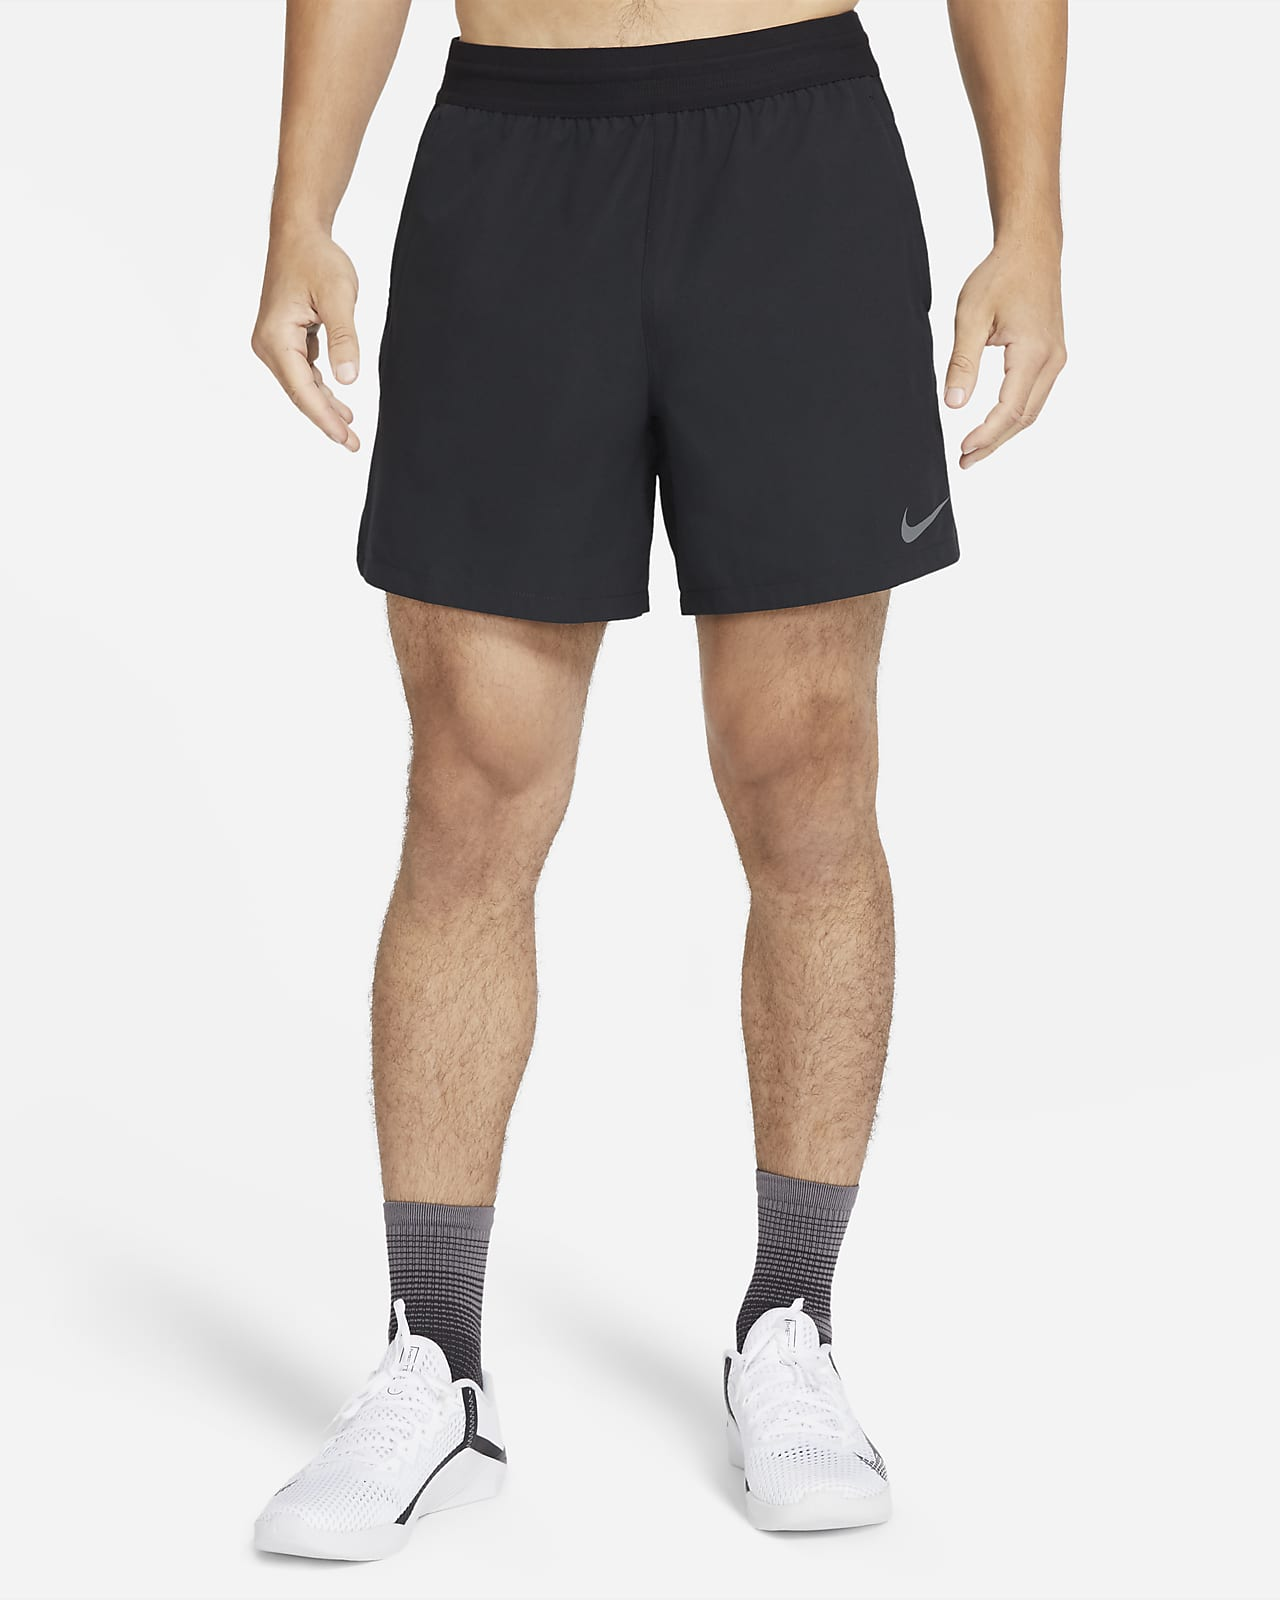 Nike Pro Pantalons curts - Home